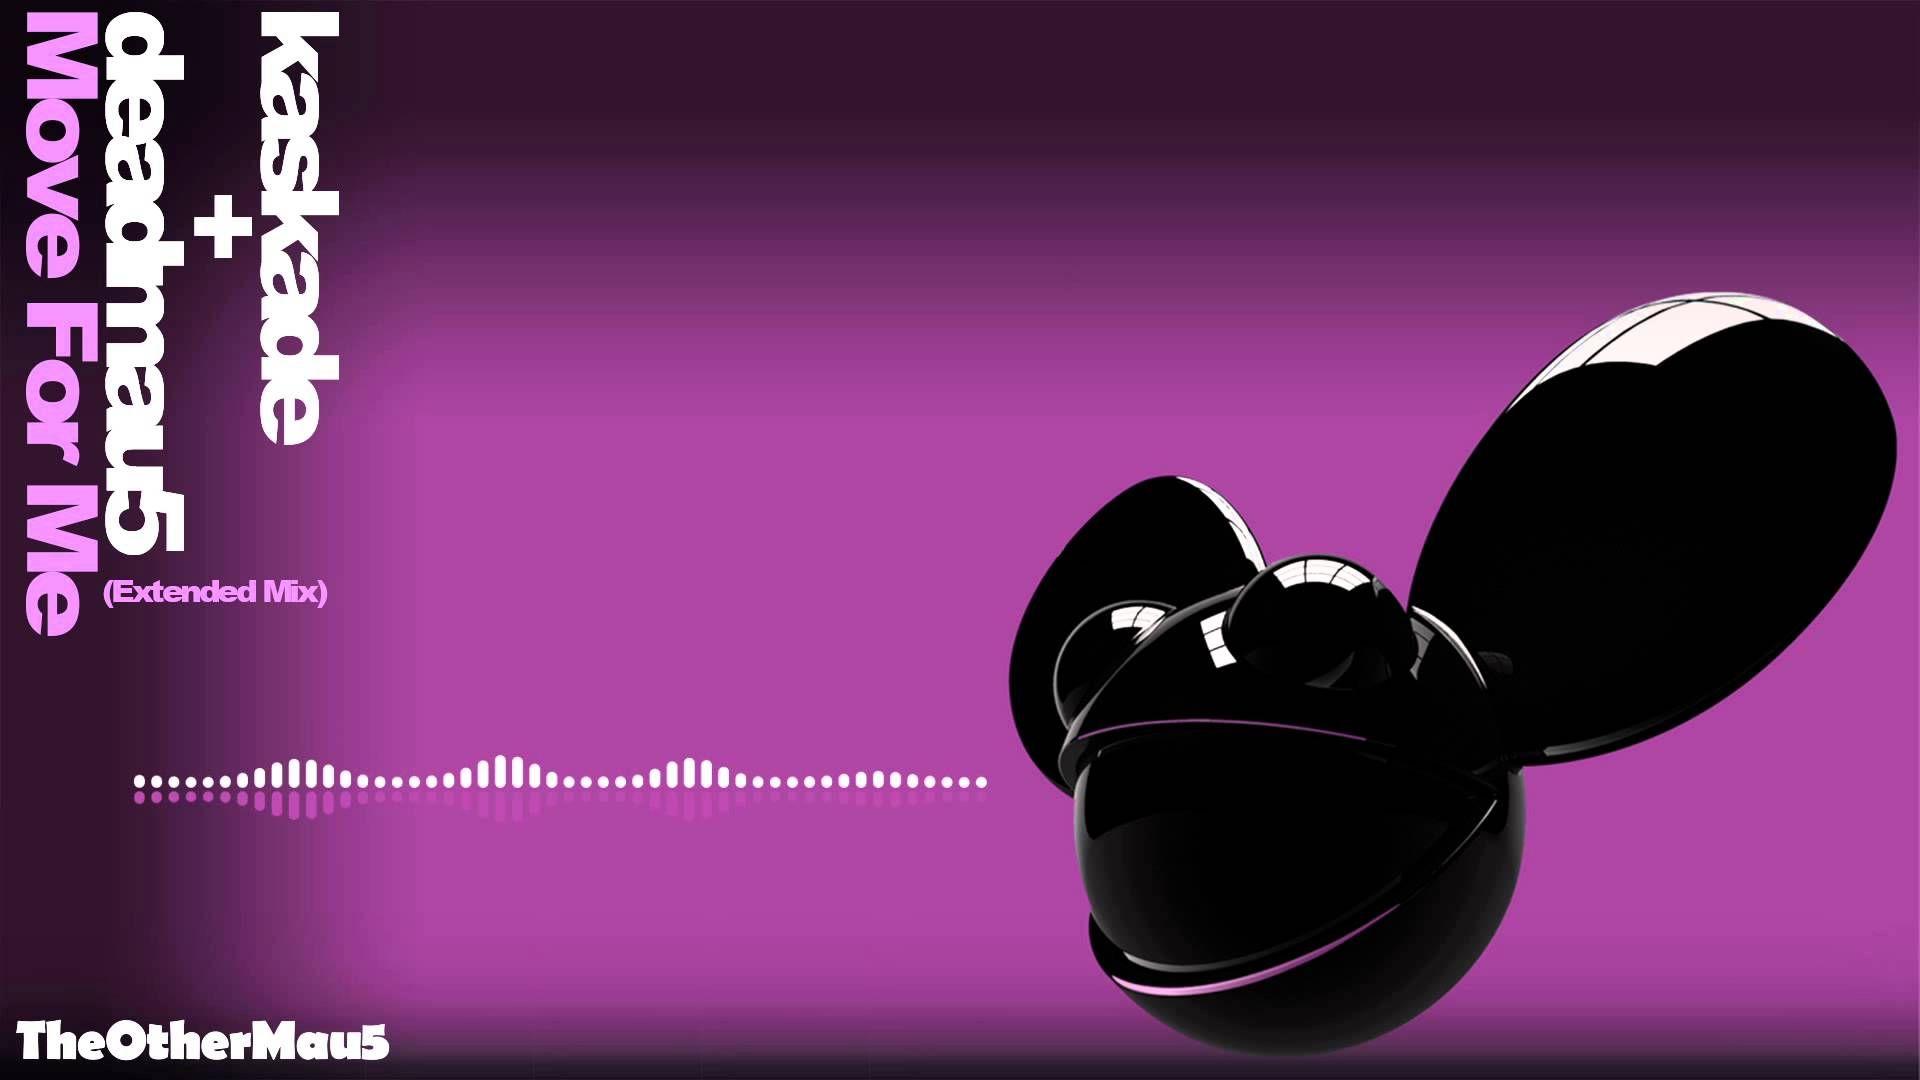 Deadmau5 Kaskade Move For Me Extended Mix 1080p Hd Kaskade Alternative Music Good Music